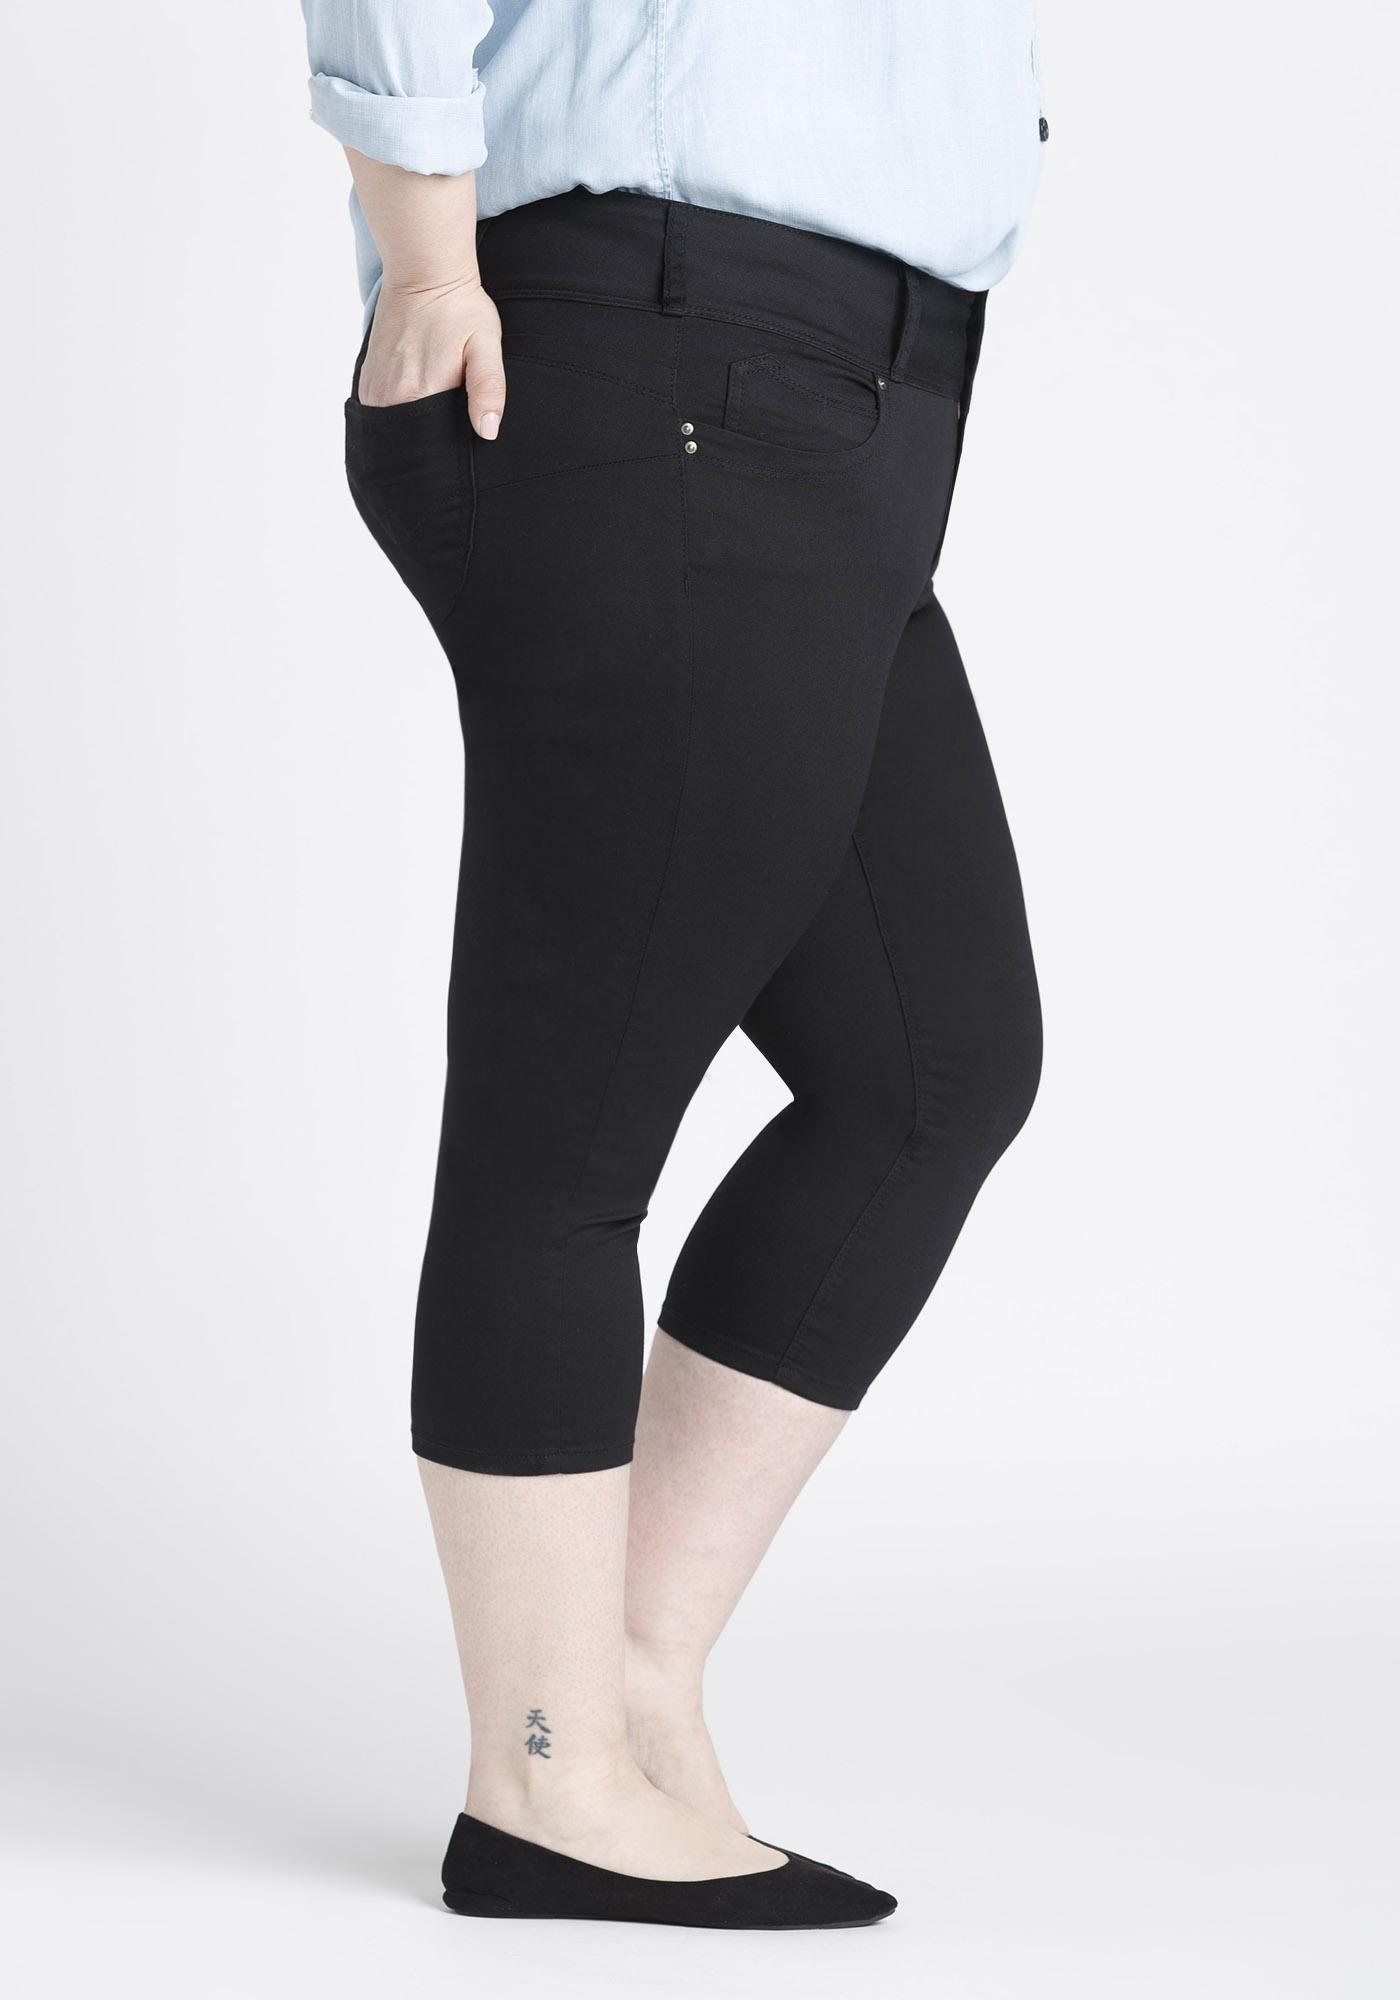 92facc5b97e ... Womens Plus Size Skinny Capri